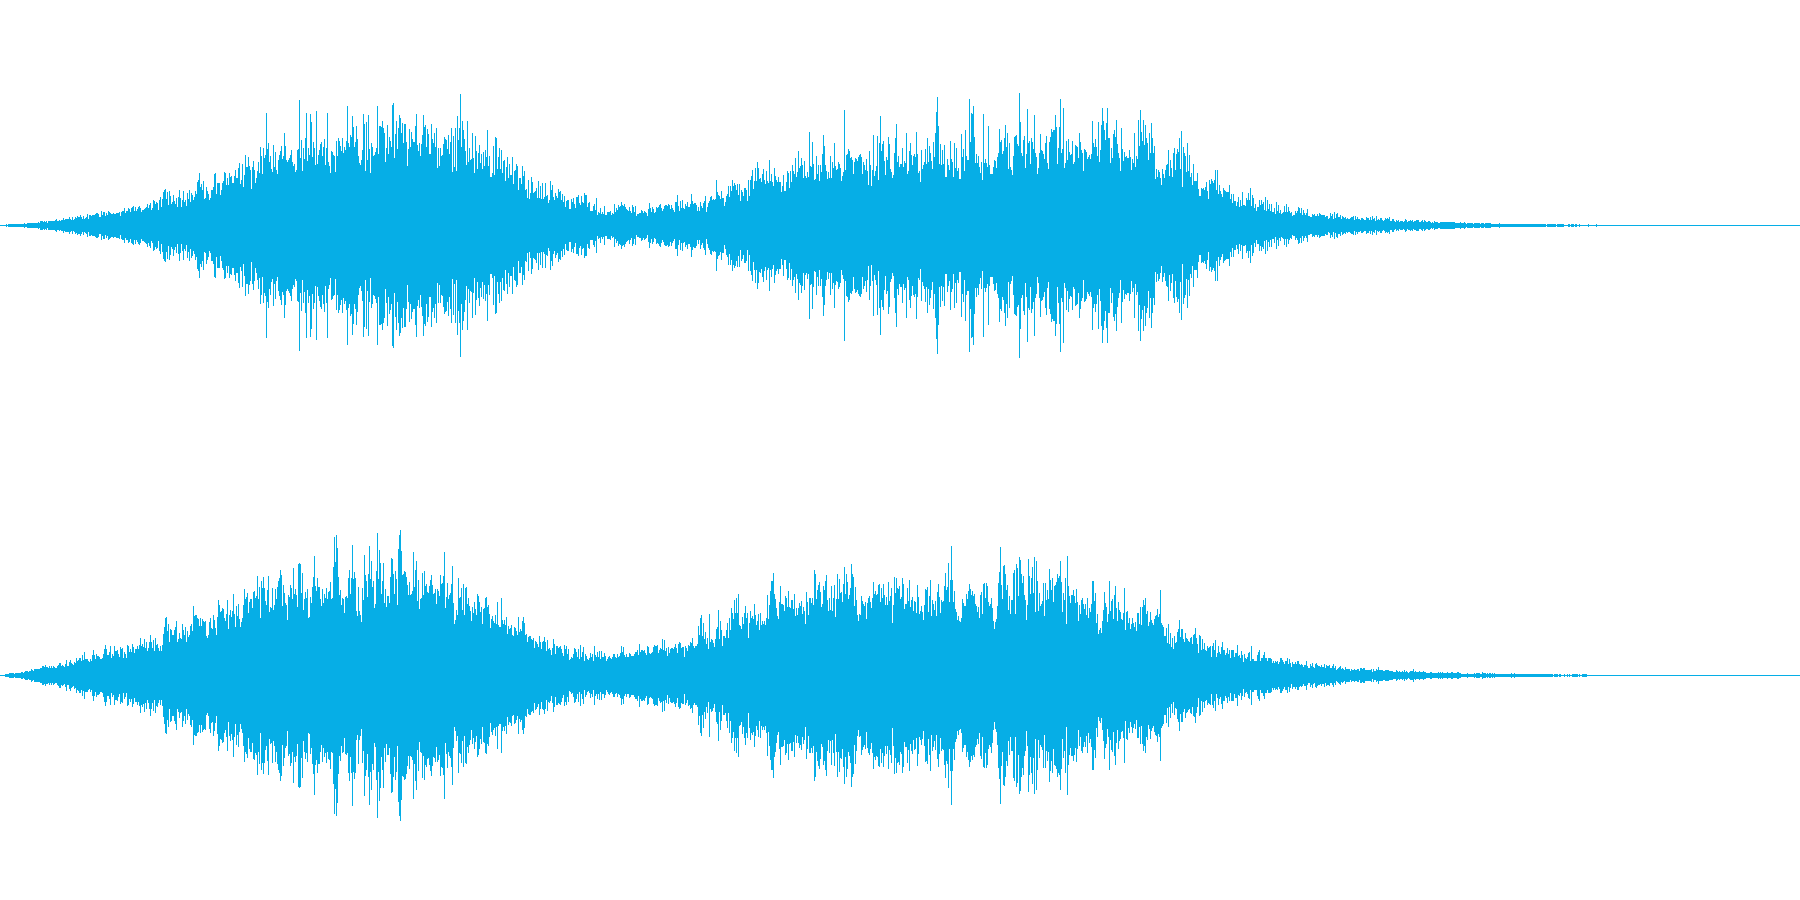 PS2風 宇宙感あるゲーム起動音の再生済みの波形